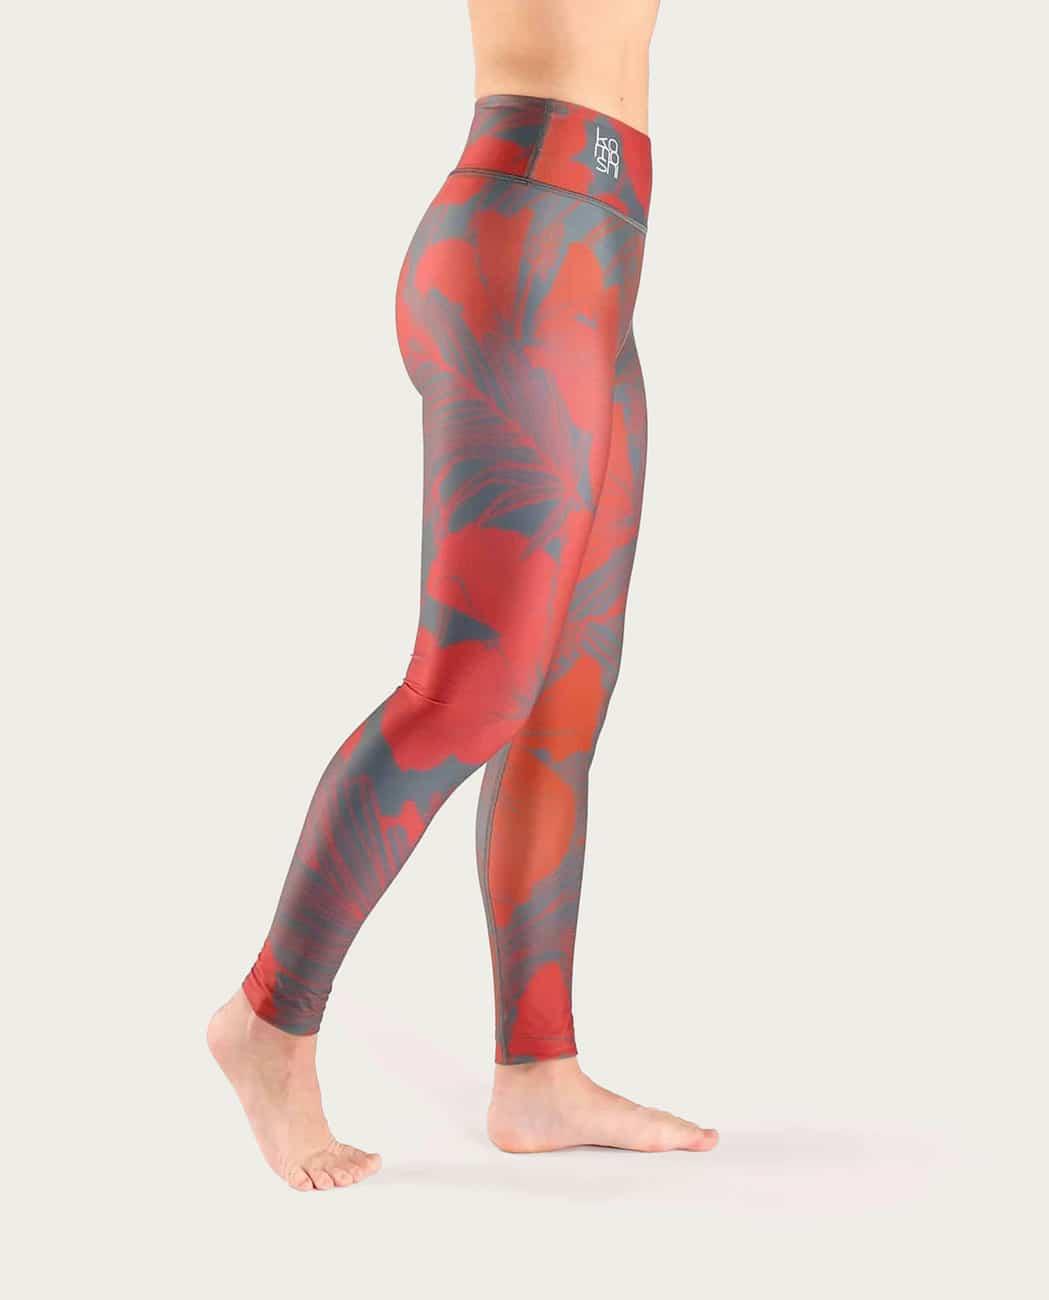 Hibiscus Yoga Leggings Komoshi Right